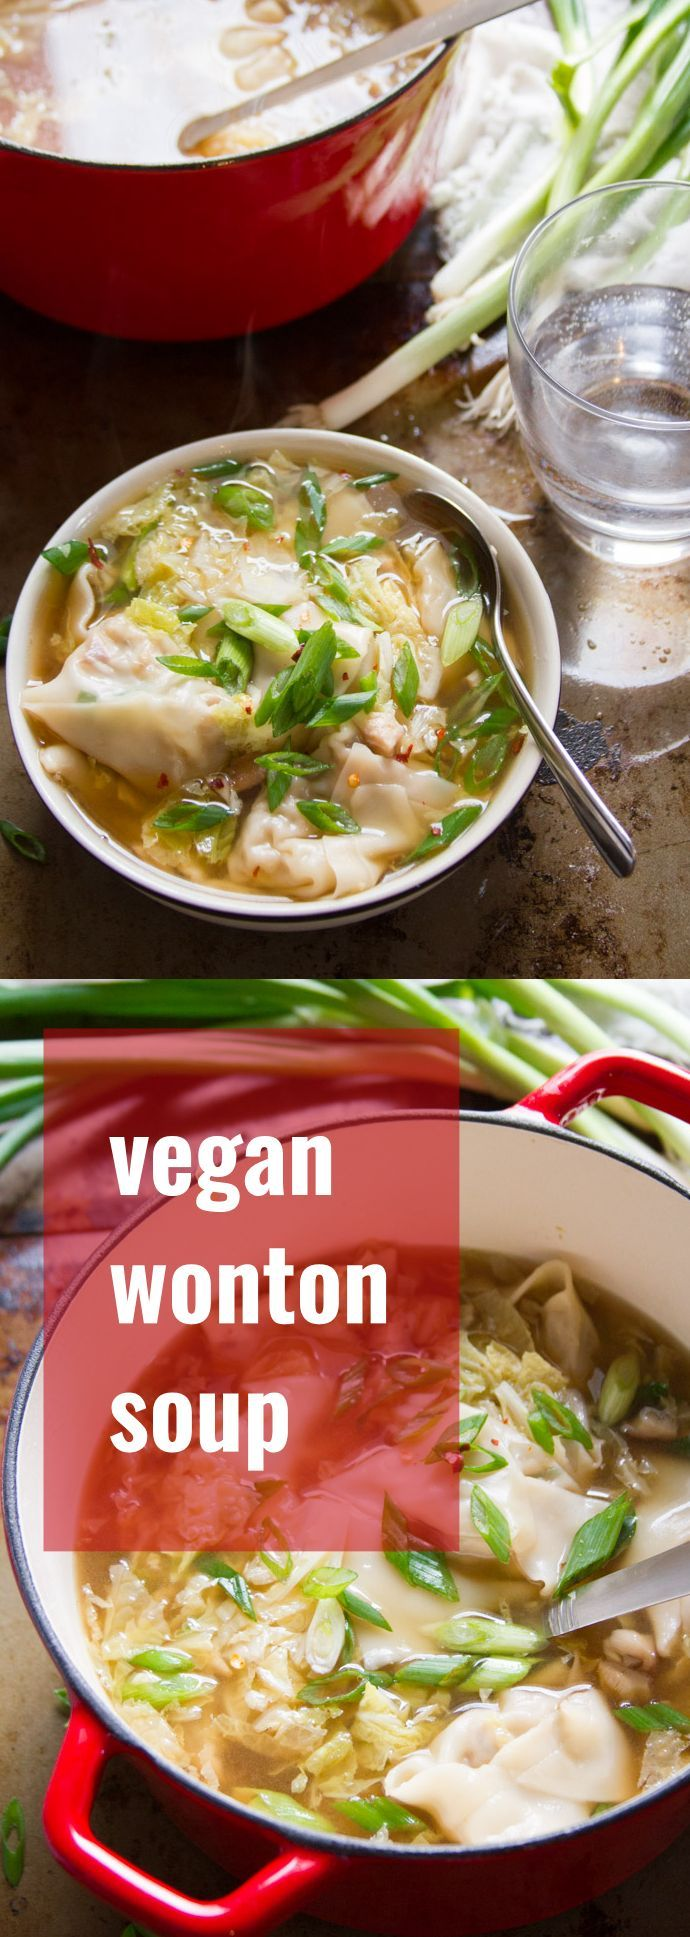 This vegan wonton soup is made with savory shiitake stuffed wontons and crispy napa cabbage ina light gingery broth.